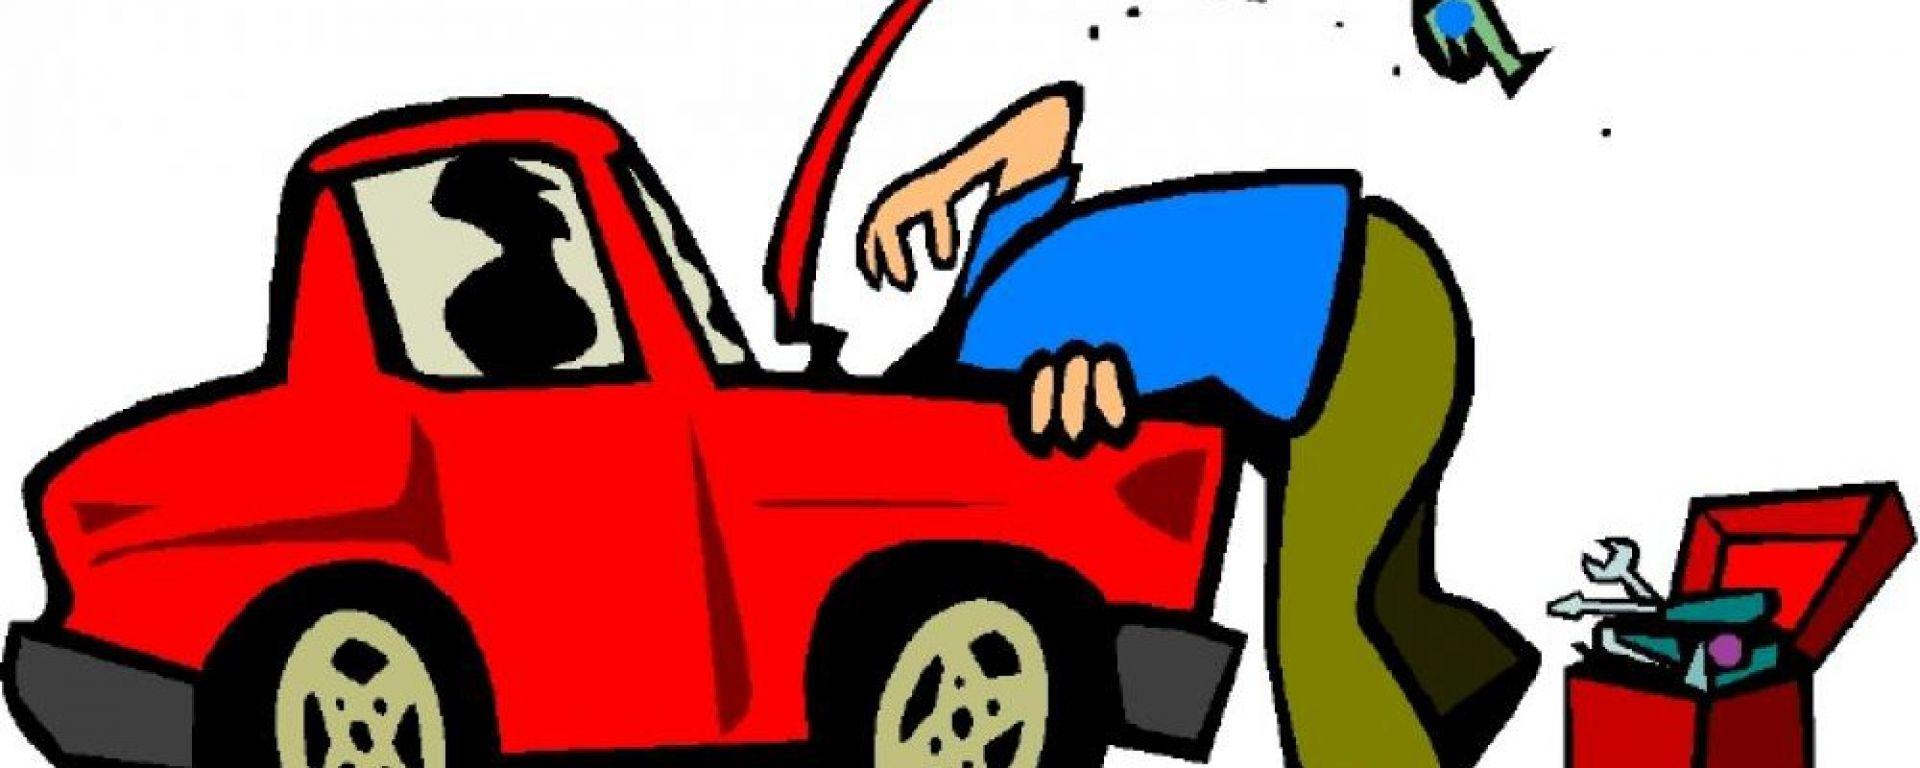 Rapporto Tüv 2014: lunga vita alle Toyota